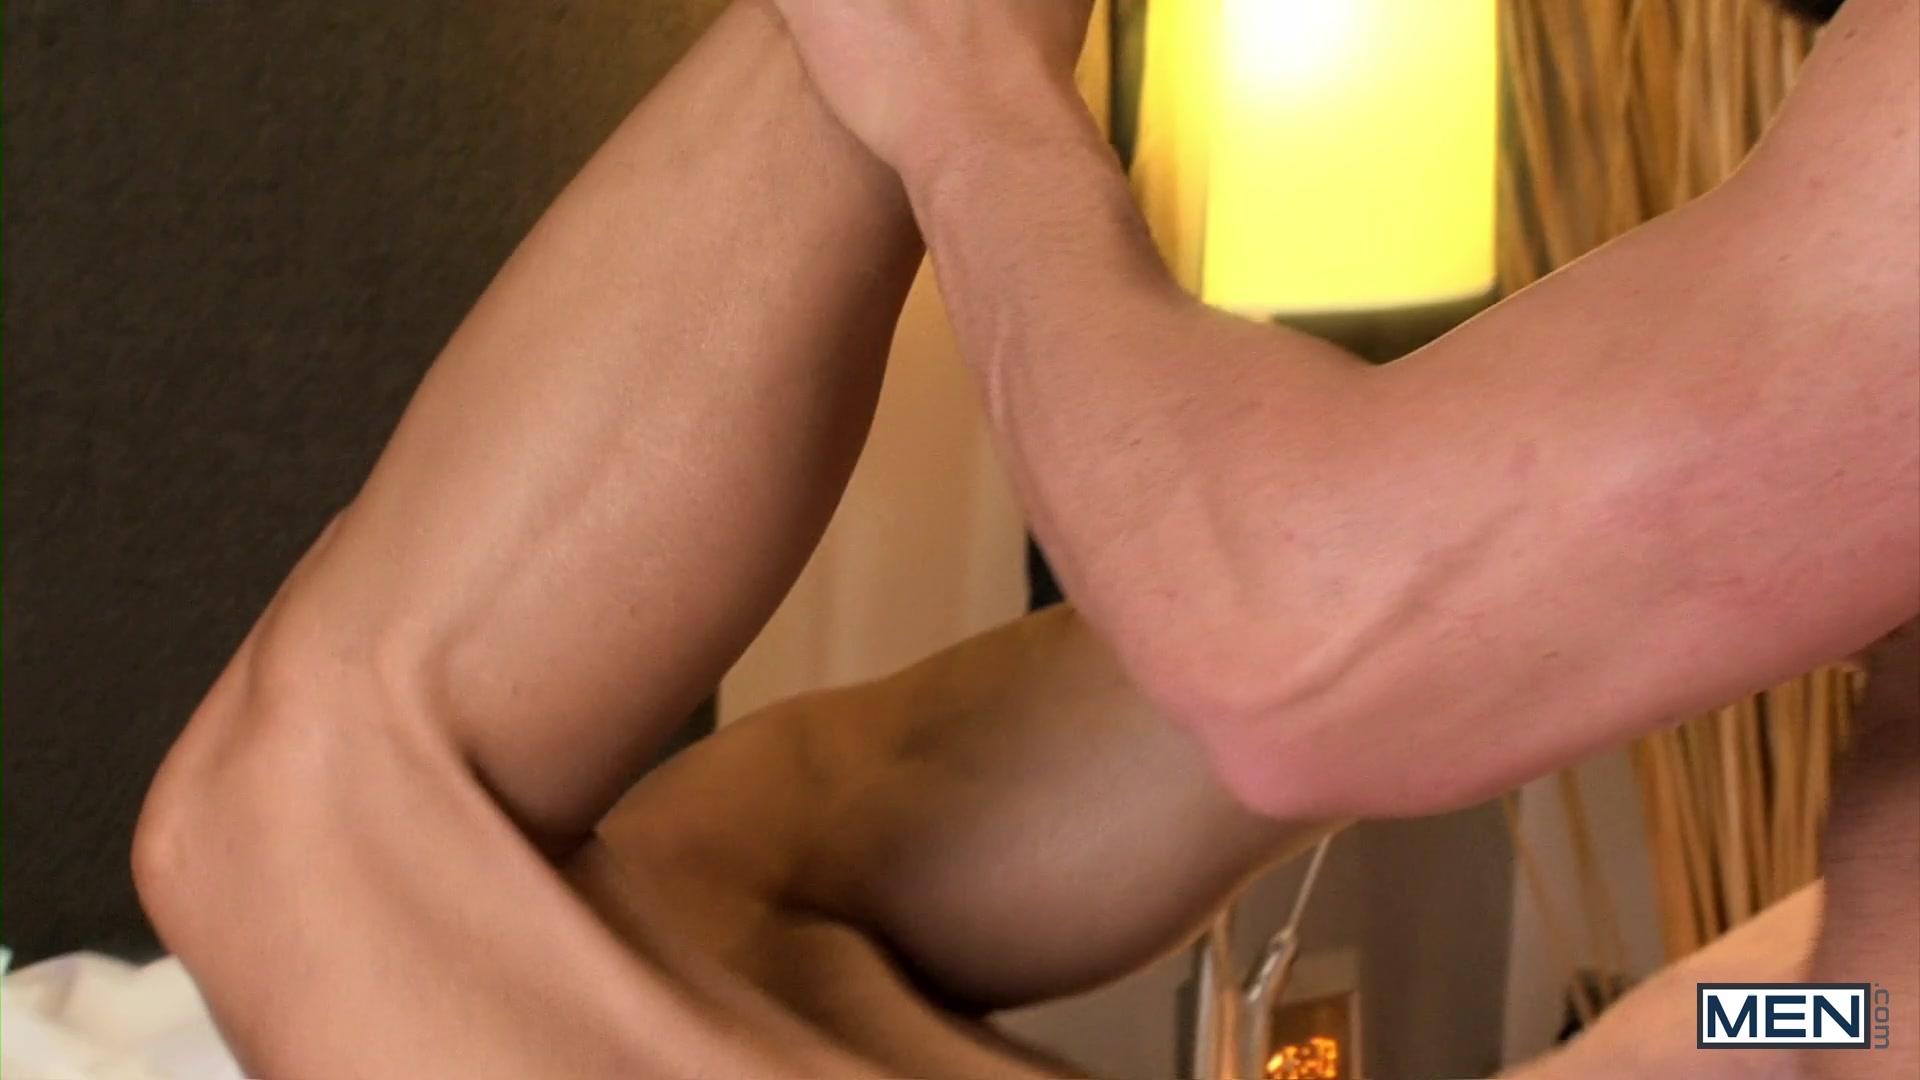 Passion Do Donato Reyes Porn passion | men gay porn movies @ gay dvd empire